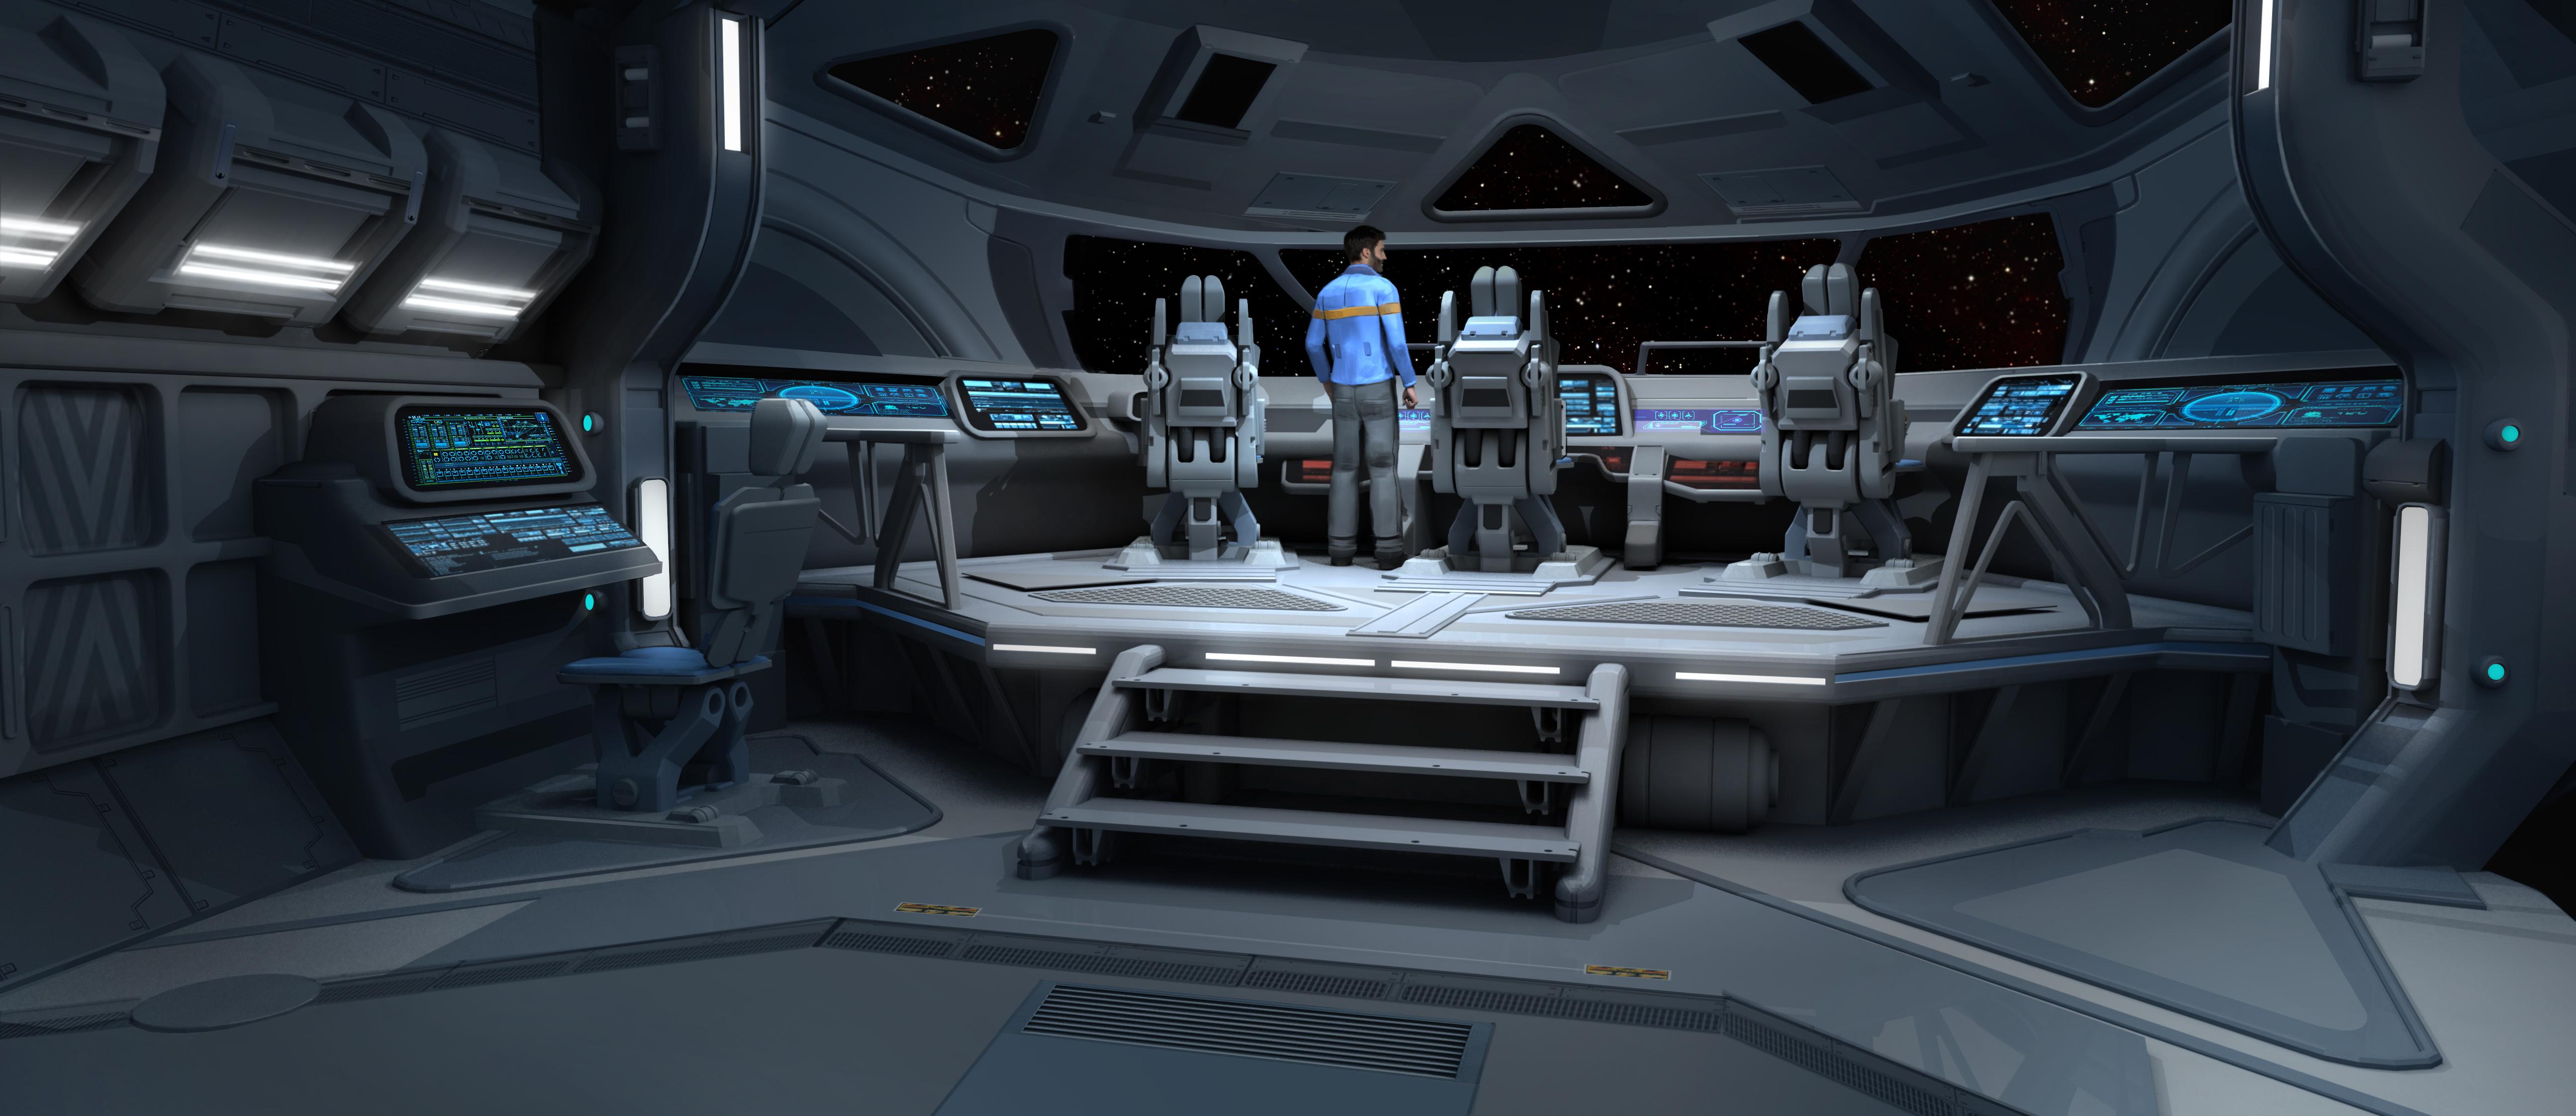 Cockpit_render_02.jpg